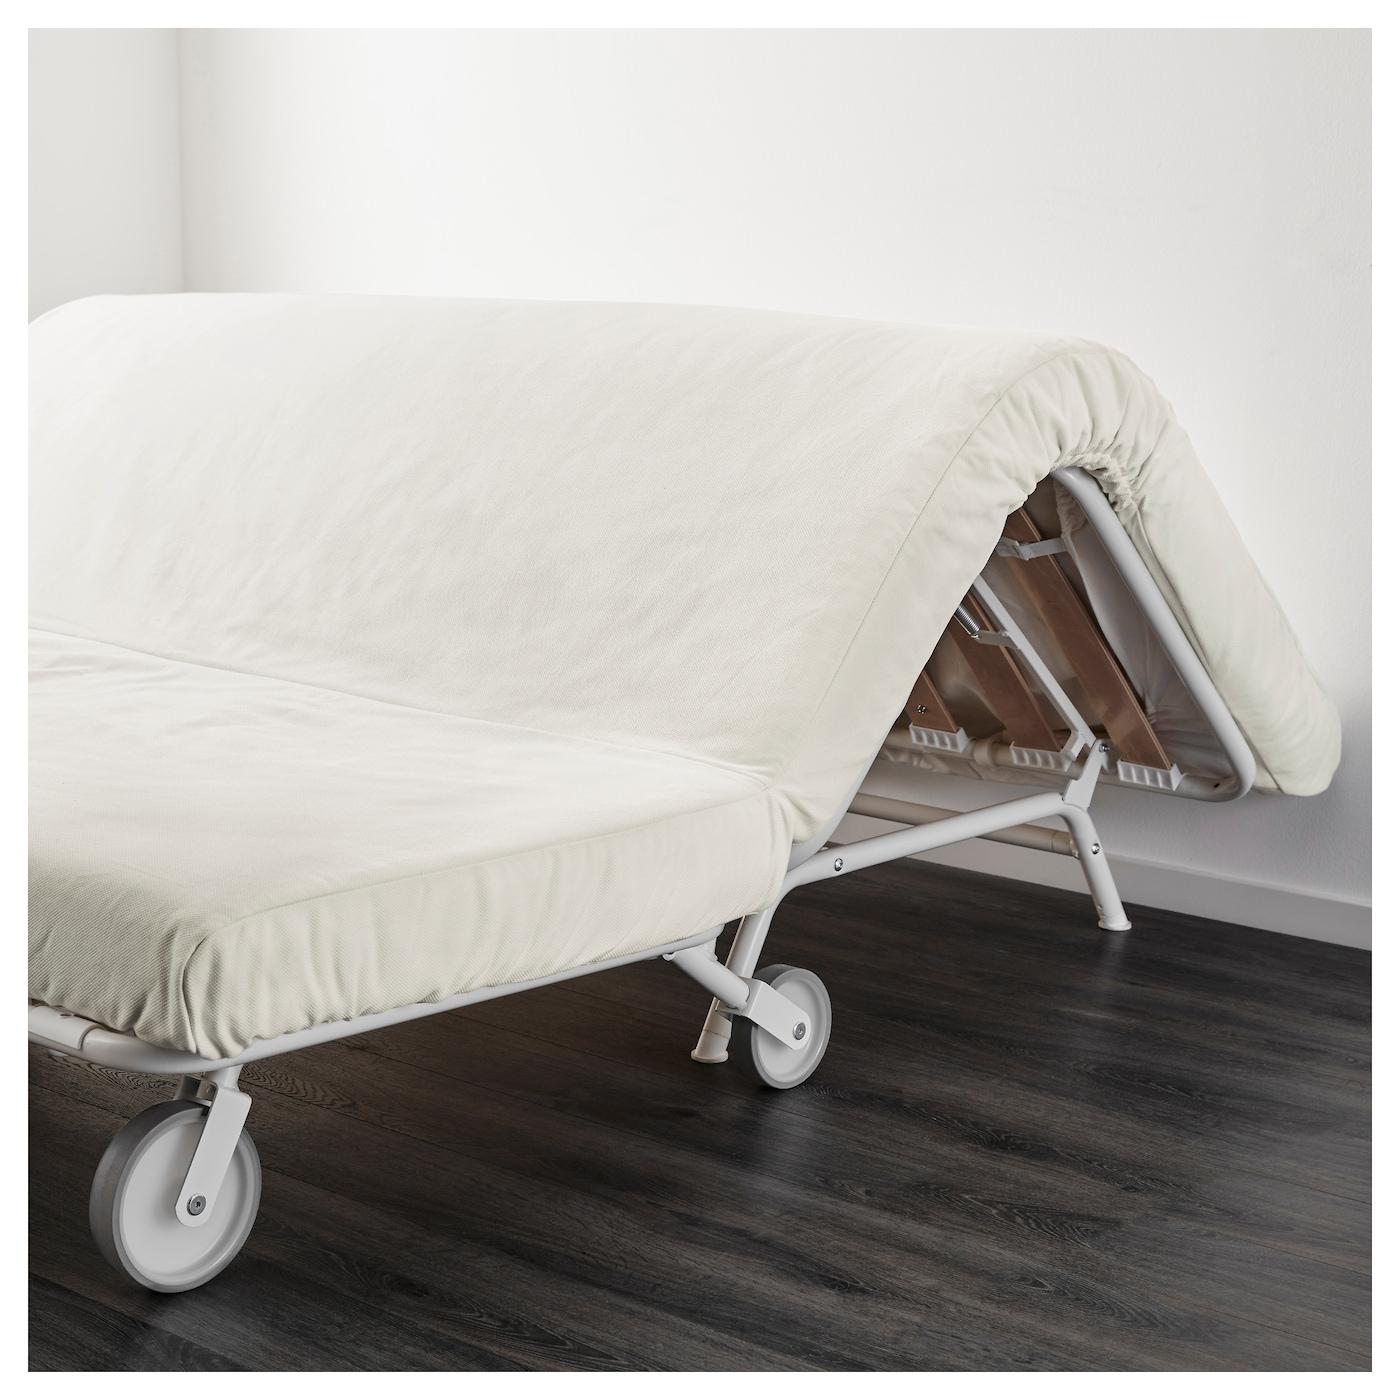 Sofa V I Mini: IKEA PS LÖVÅS Two-seat Sofa-bed Gräsbo White